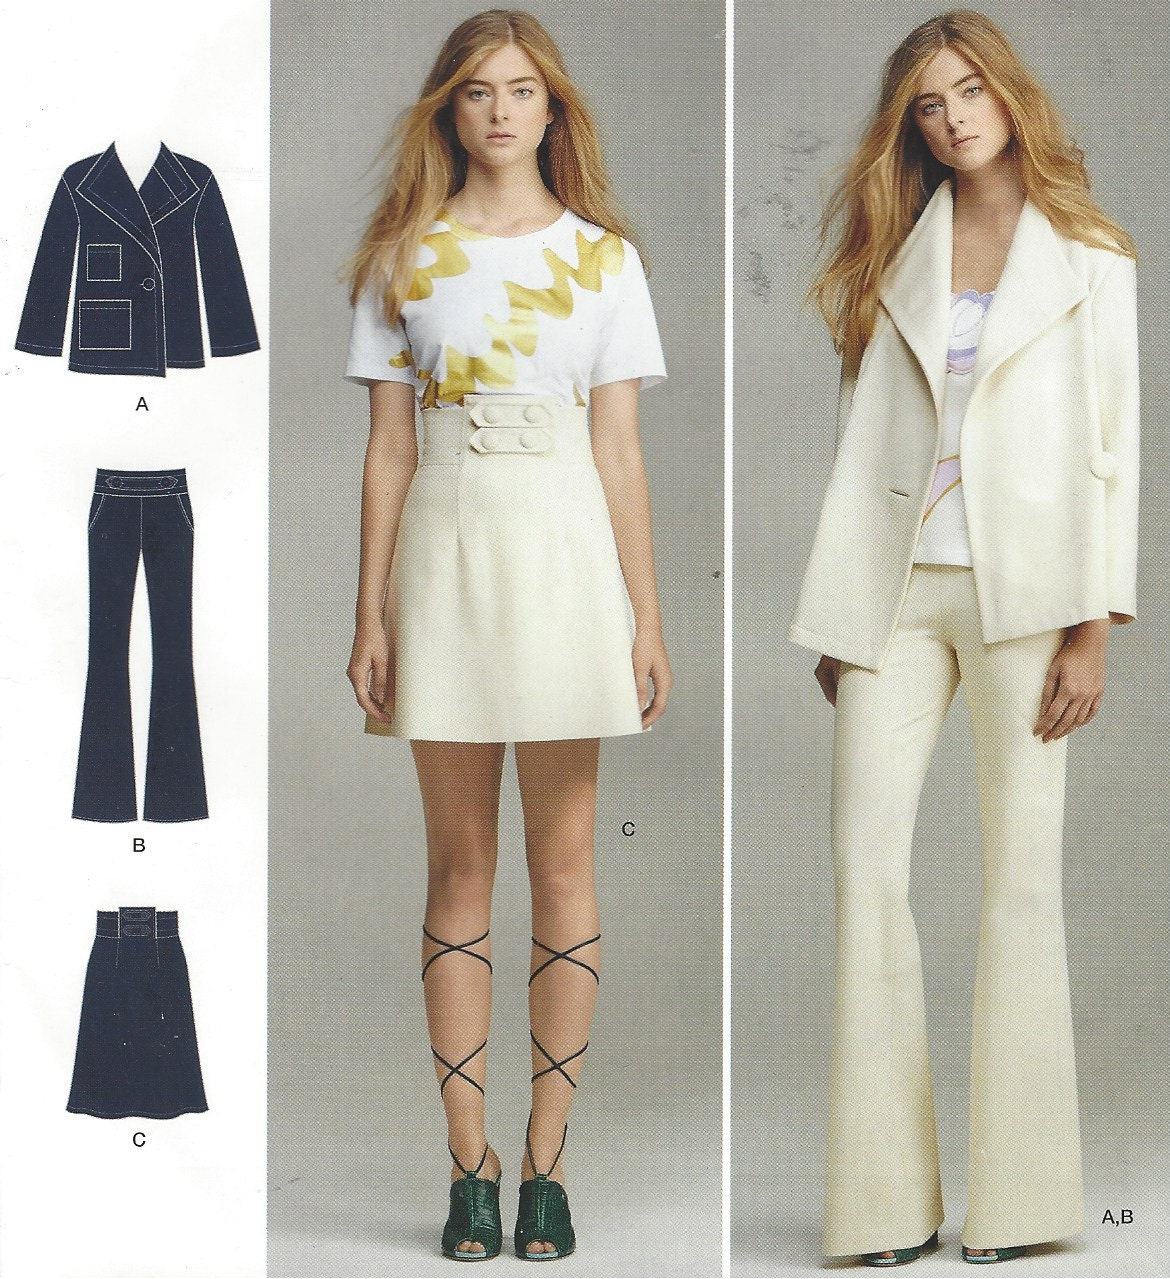 Cynthia Rowley Sewing Patterns: Cynthia Rowley Womens Jacket, High Waist Skirt And Knit